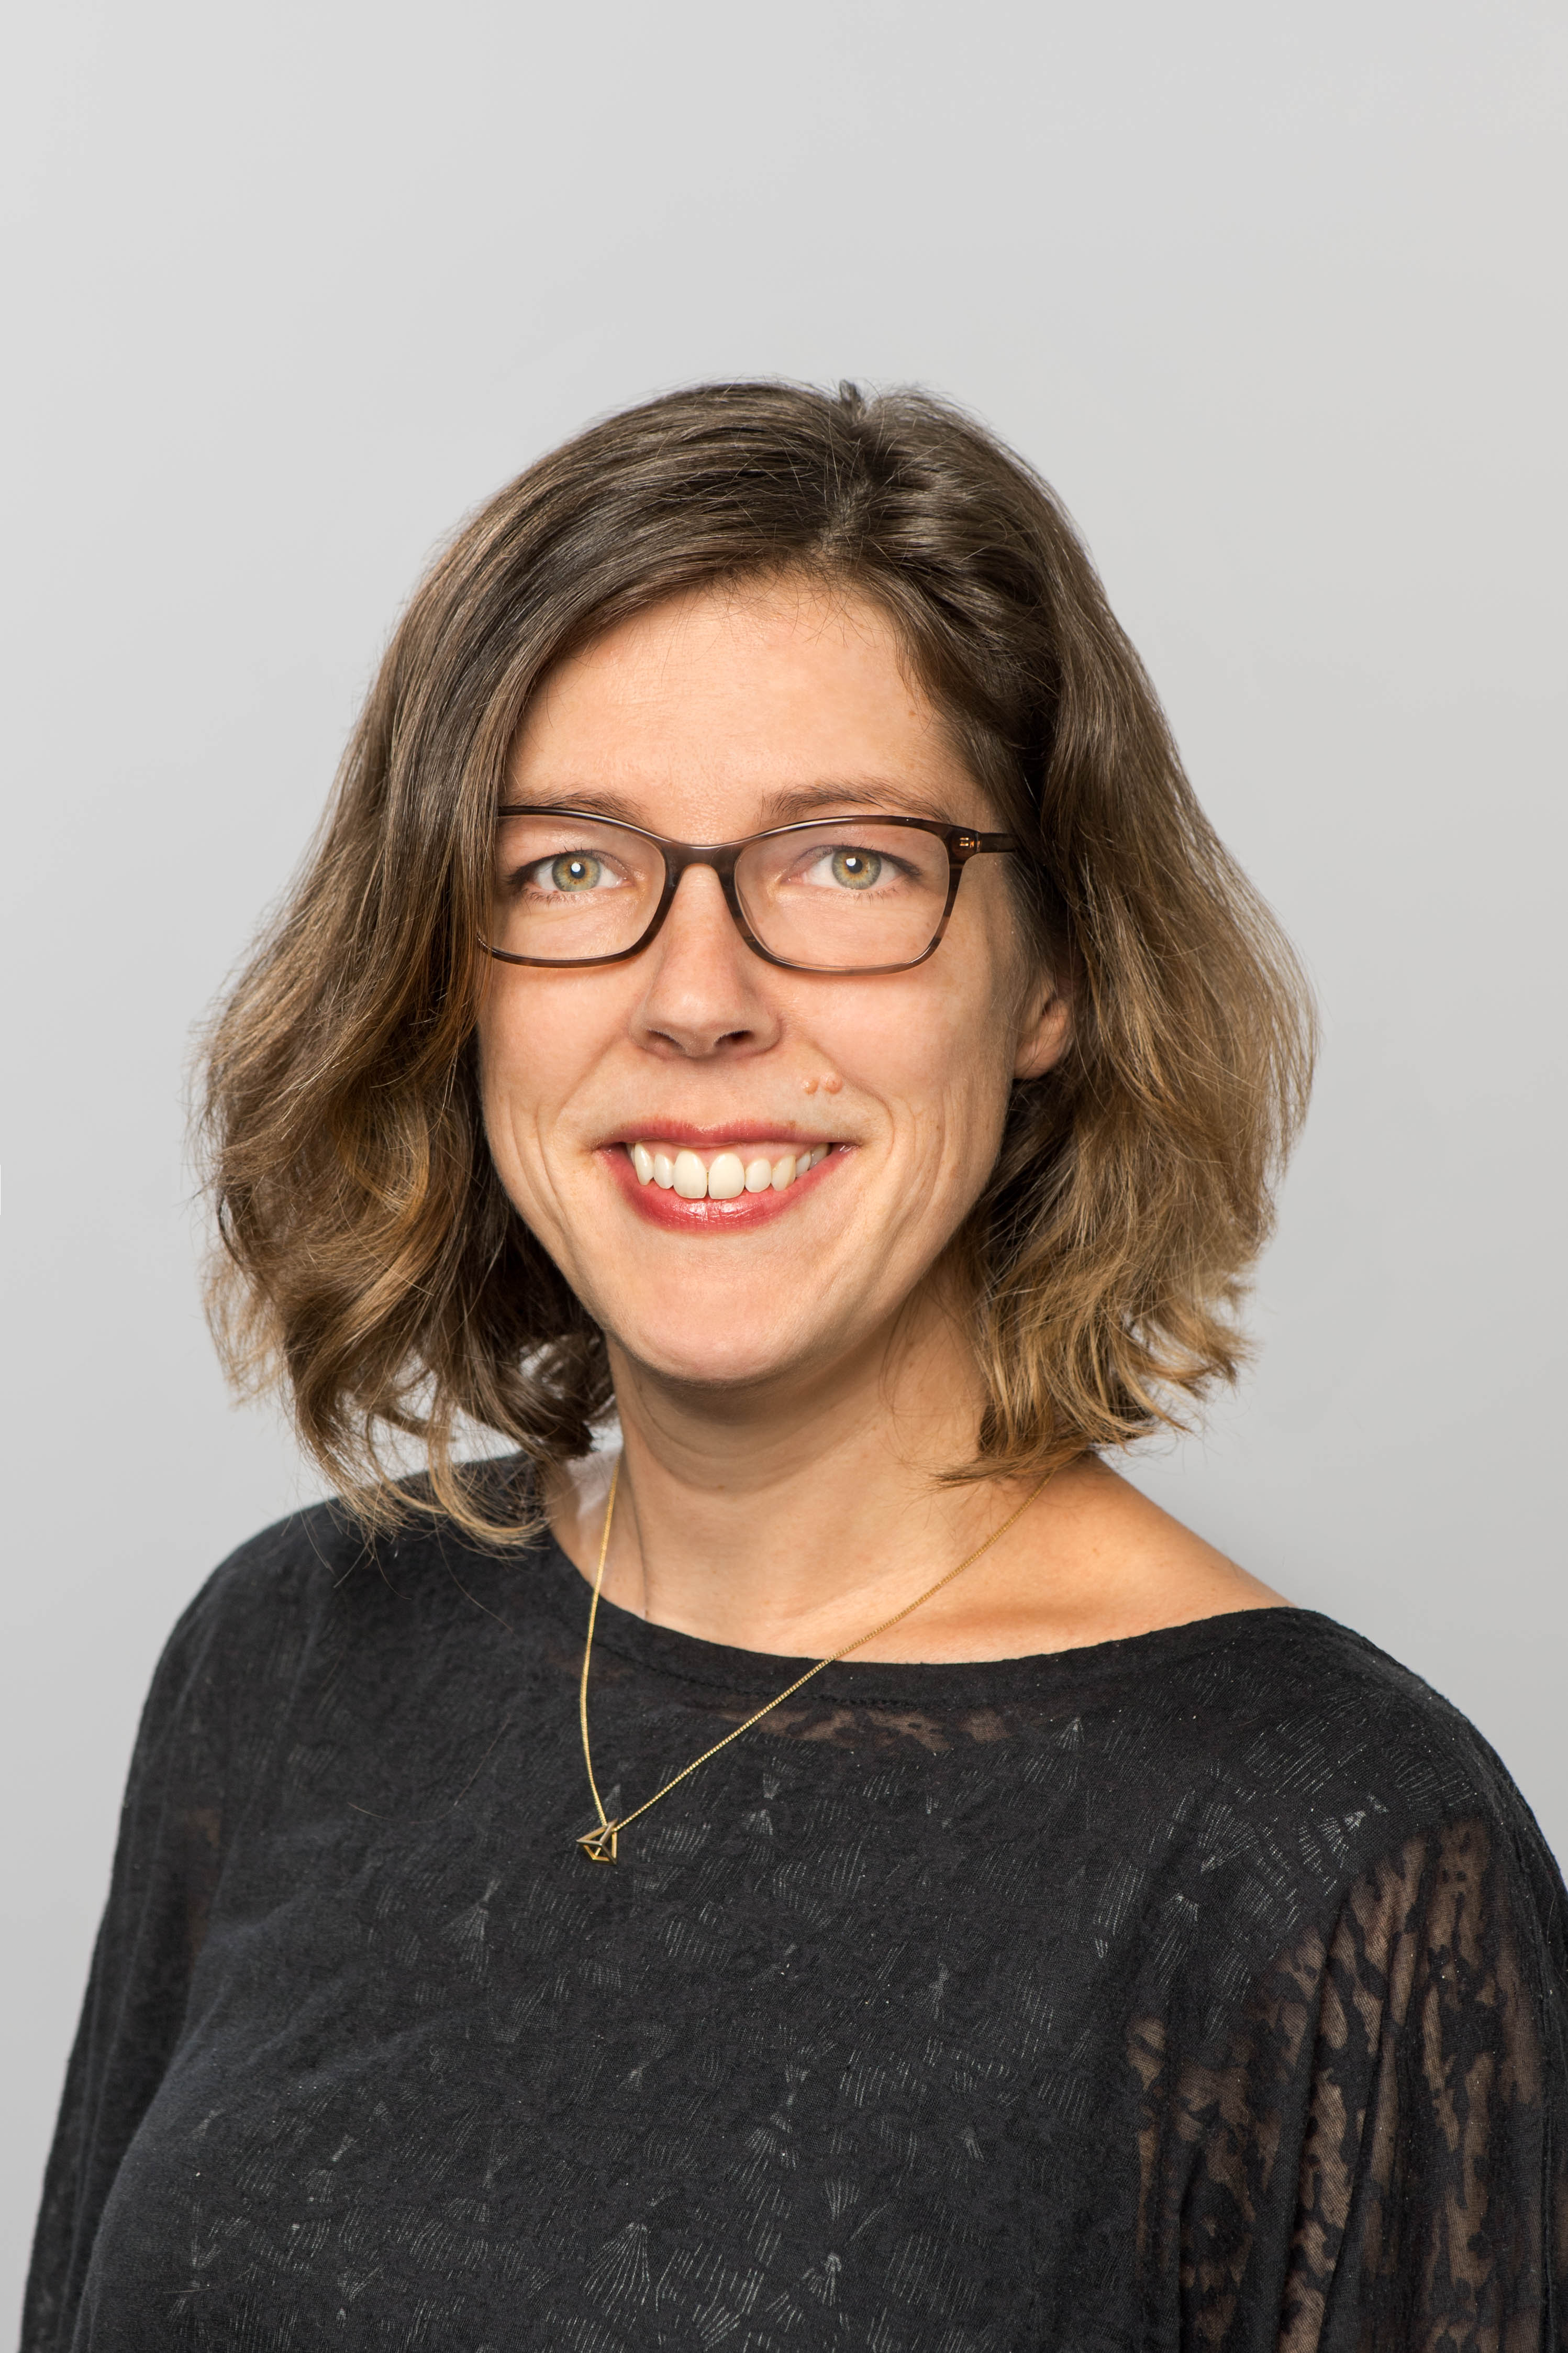 Sarah de Rijcke